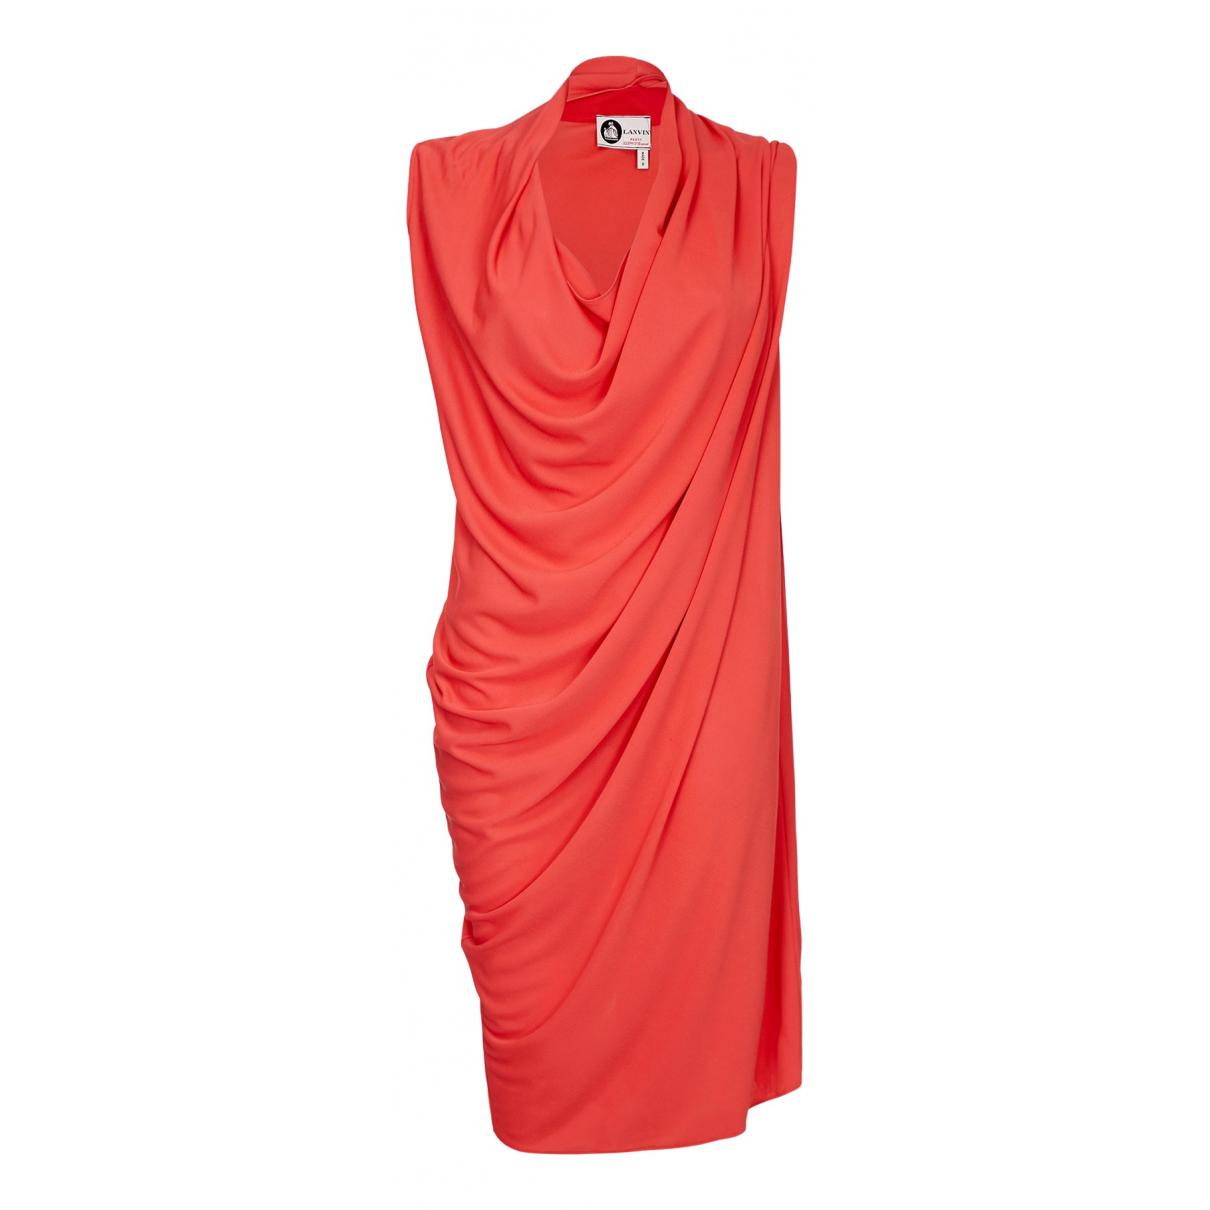 Lanvin N Red Cotton dress for Women 12 UK